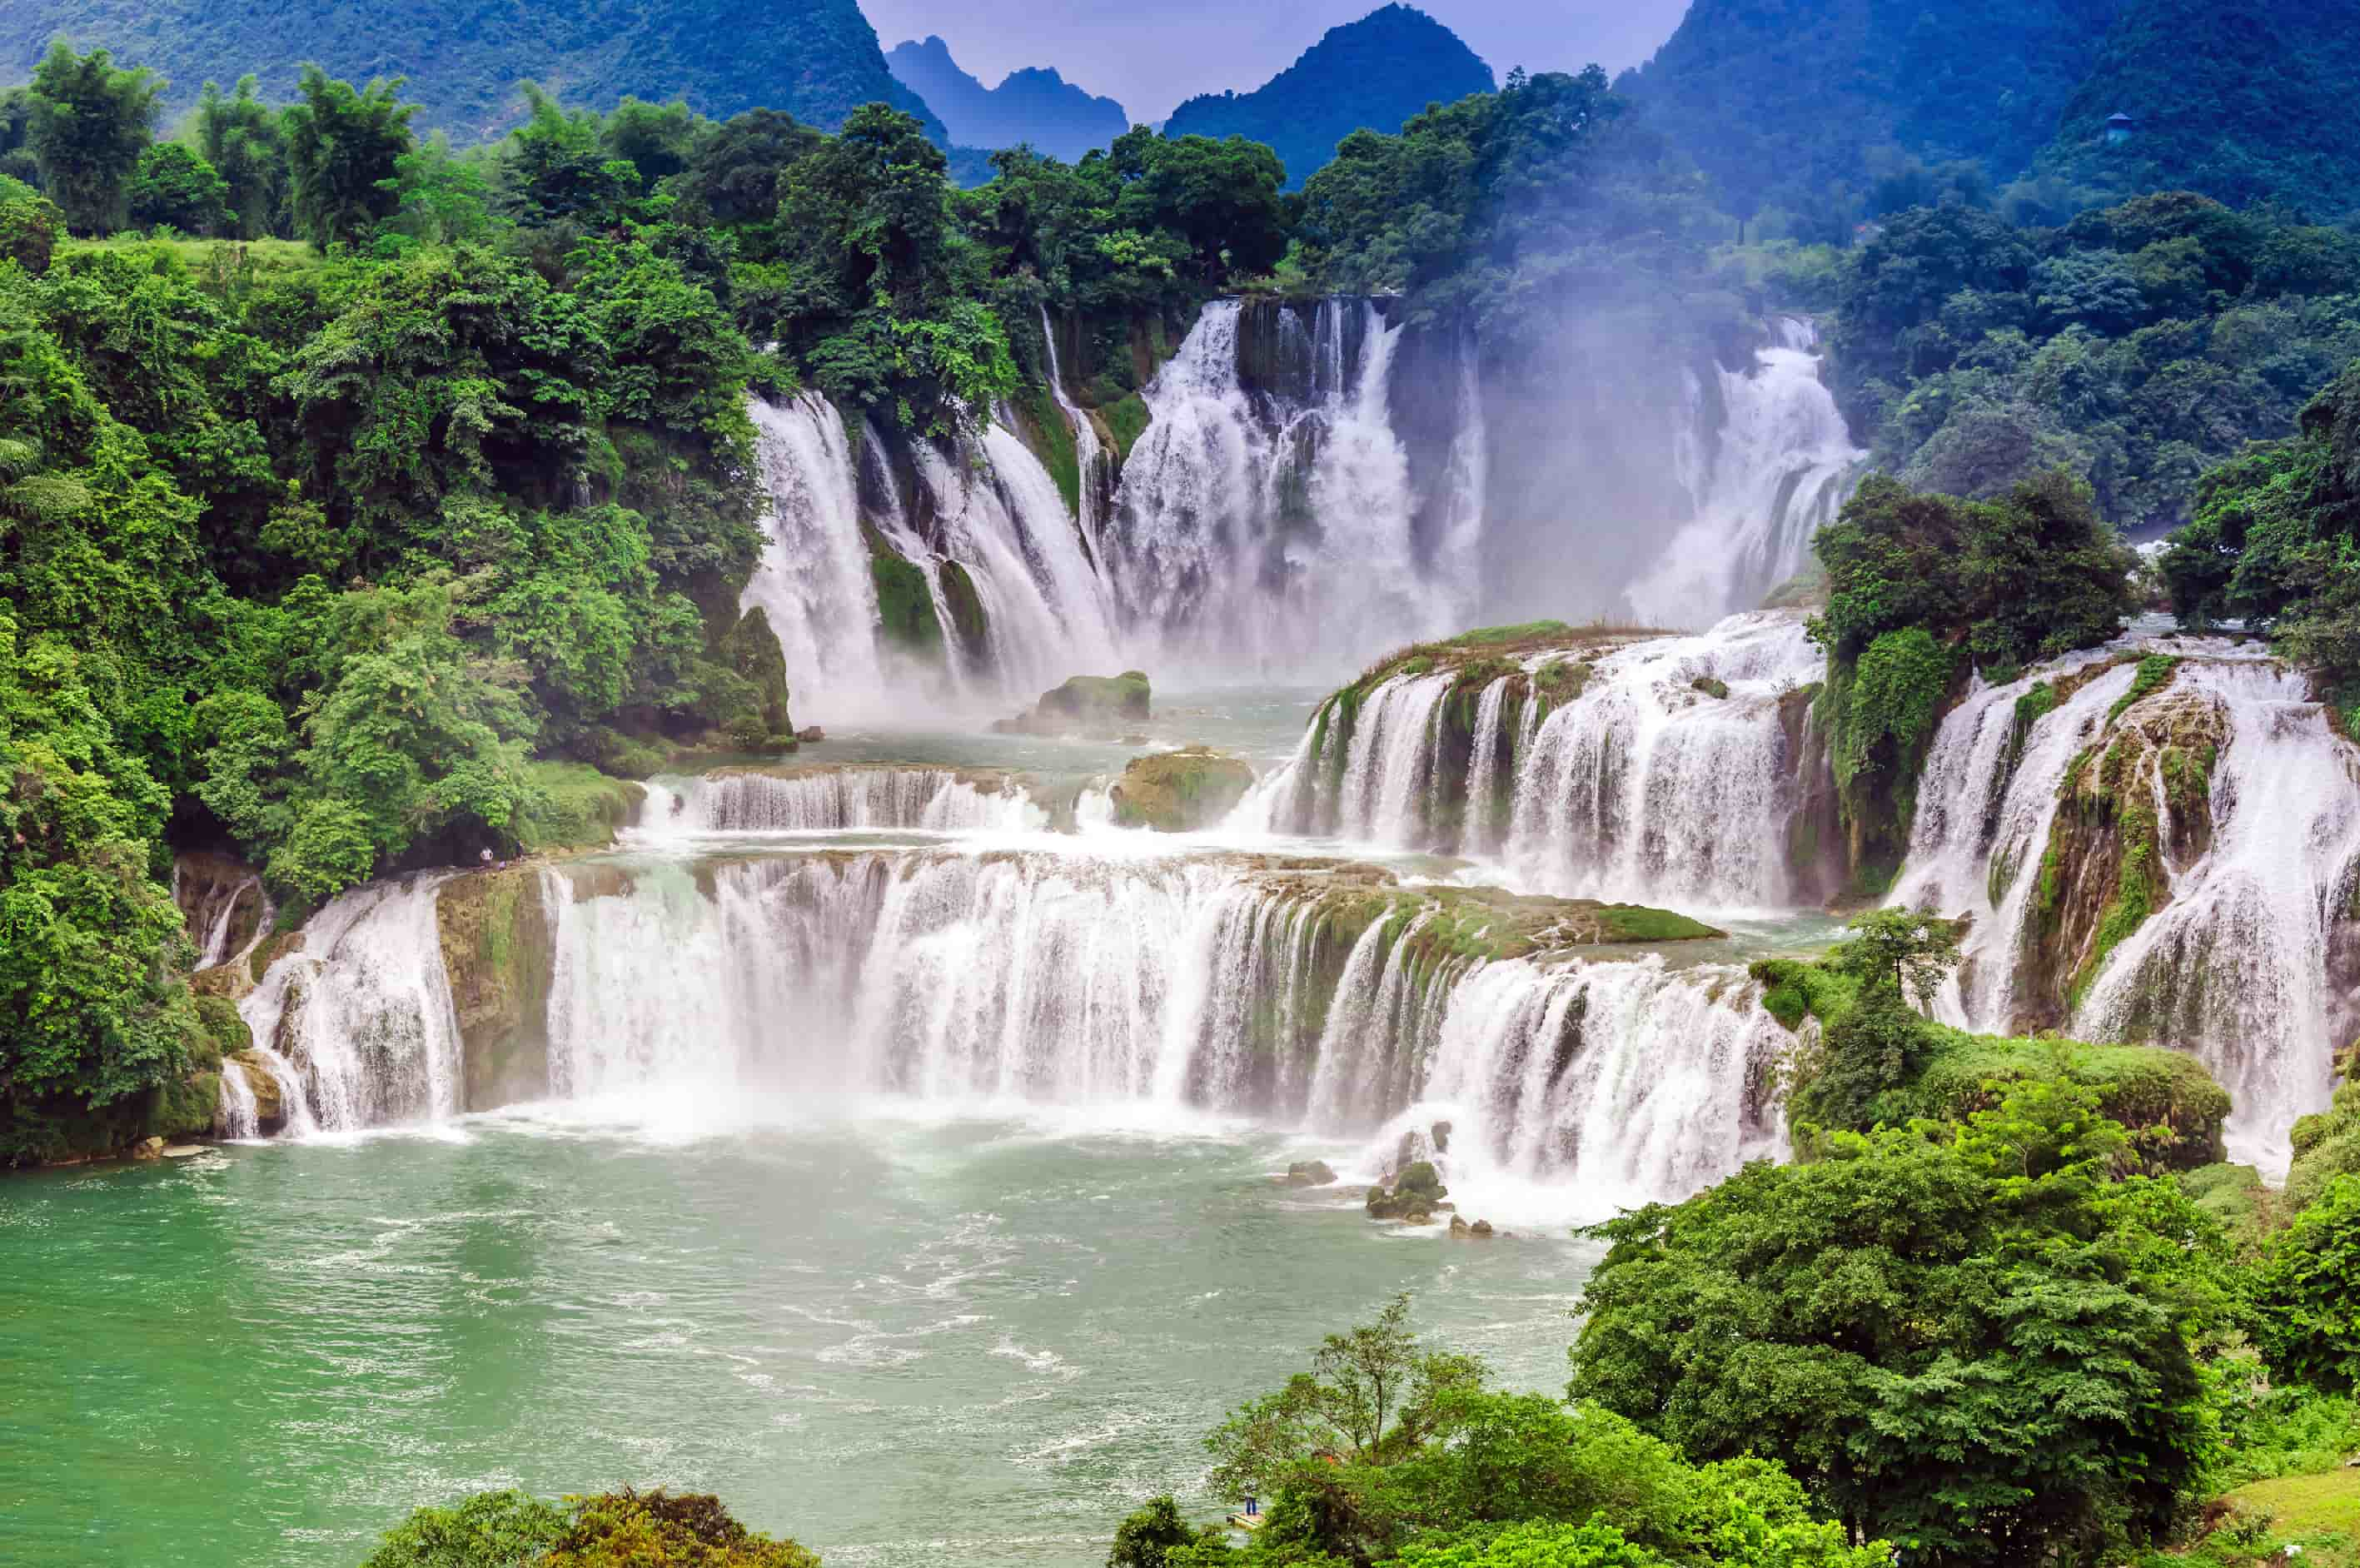 ban gioc waterfall travel guide